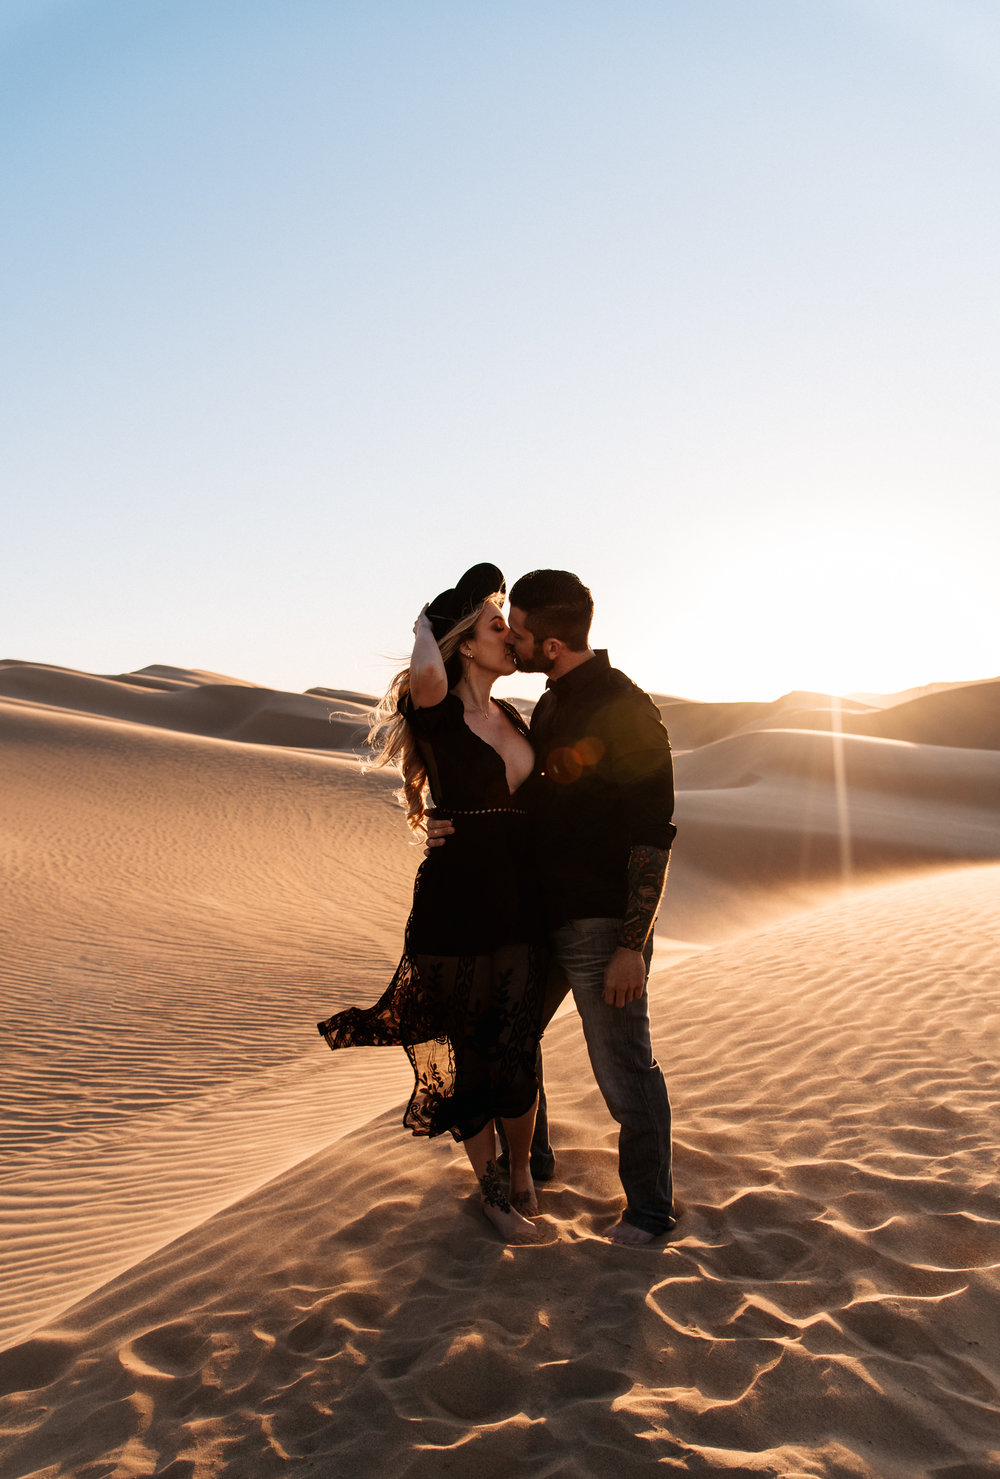 SamErica Studios - Modern San Diego Engagement Photographer - Adventure Engagement Session in Glamis Sand Dunes California-44.jpg